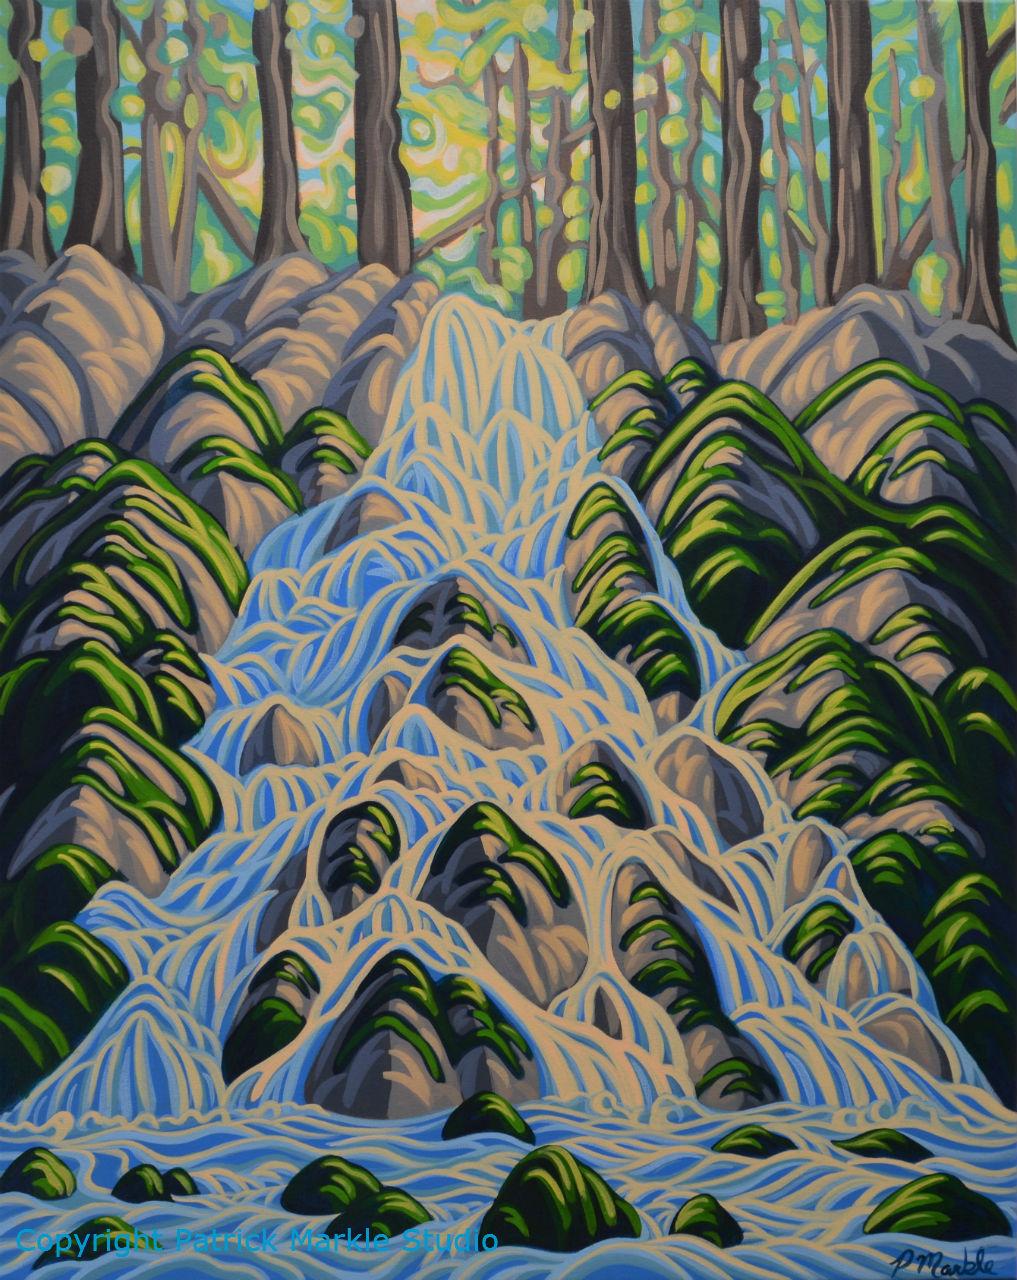 Patrick Markle, Canadian Artist, Albert, Landscape Painting